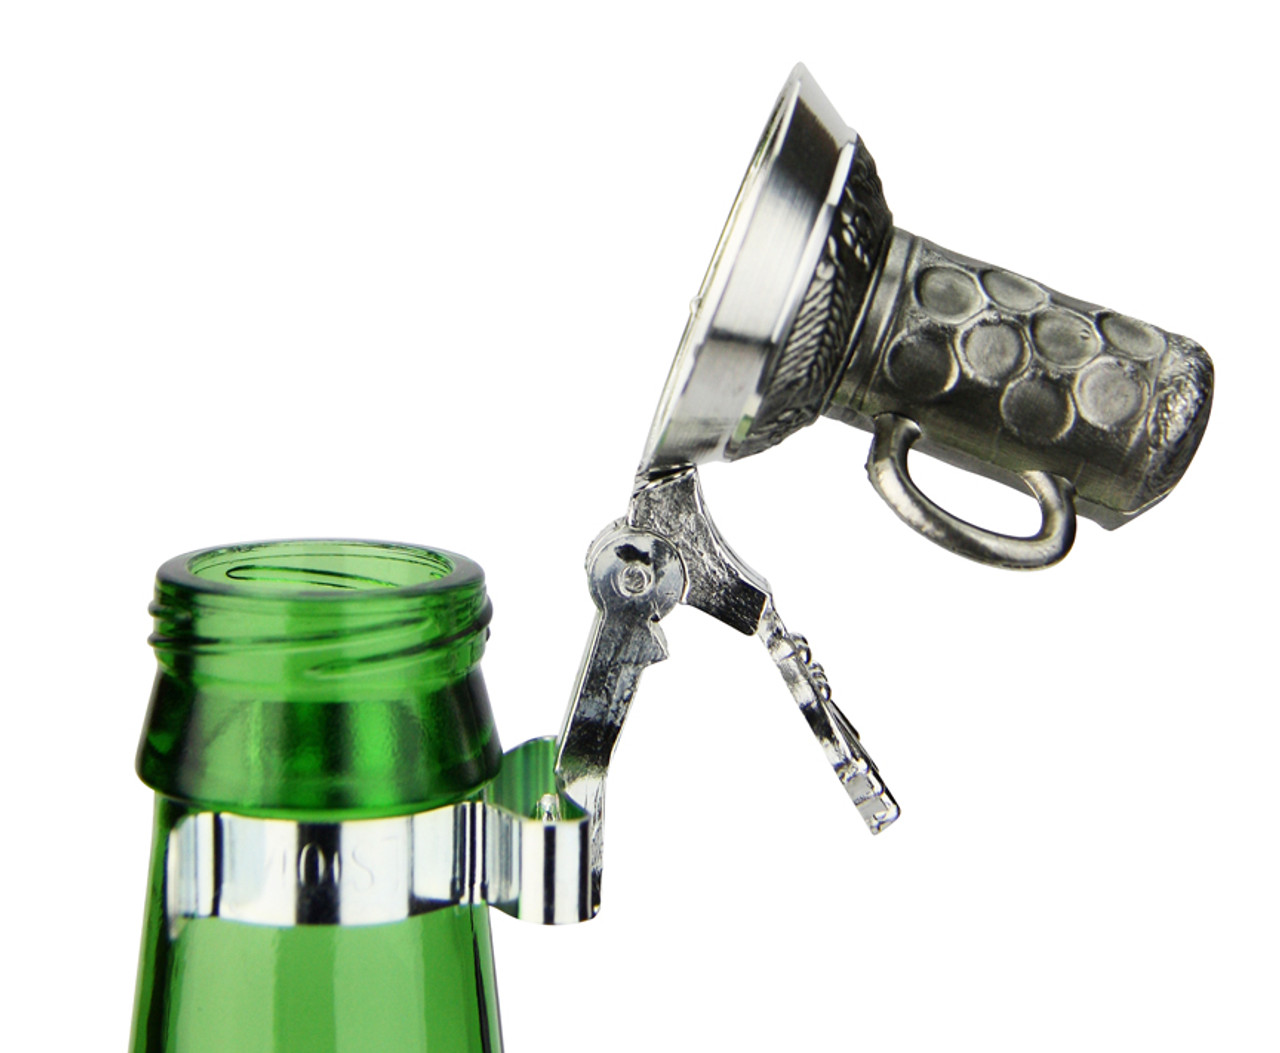 Oktoberfest Mug Beer Stein Lid for Beer Bottles